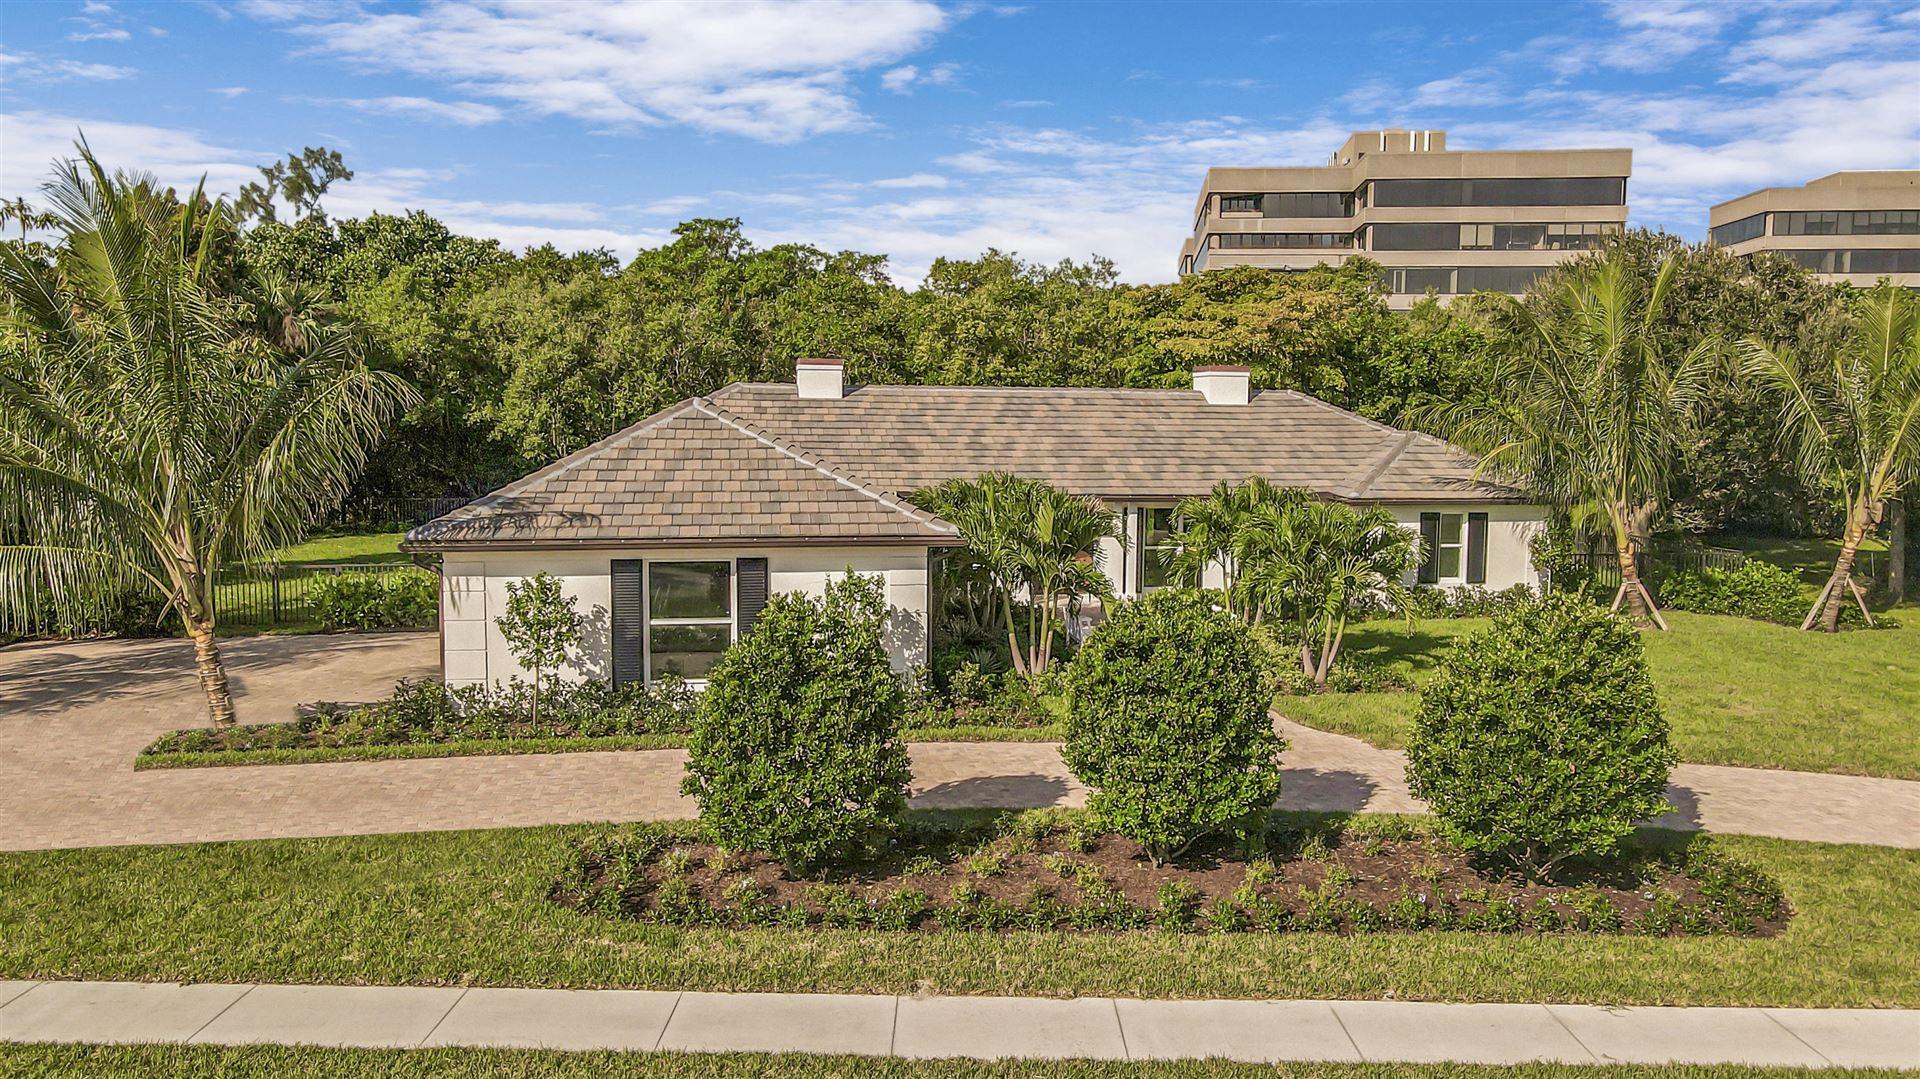 Photo of 11785 Lake Shore Place, North Palm Beach, FL 33408 (MLS # RX-10674320)